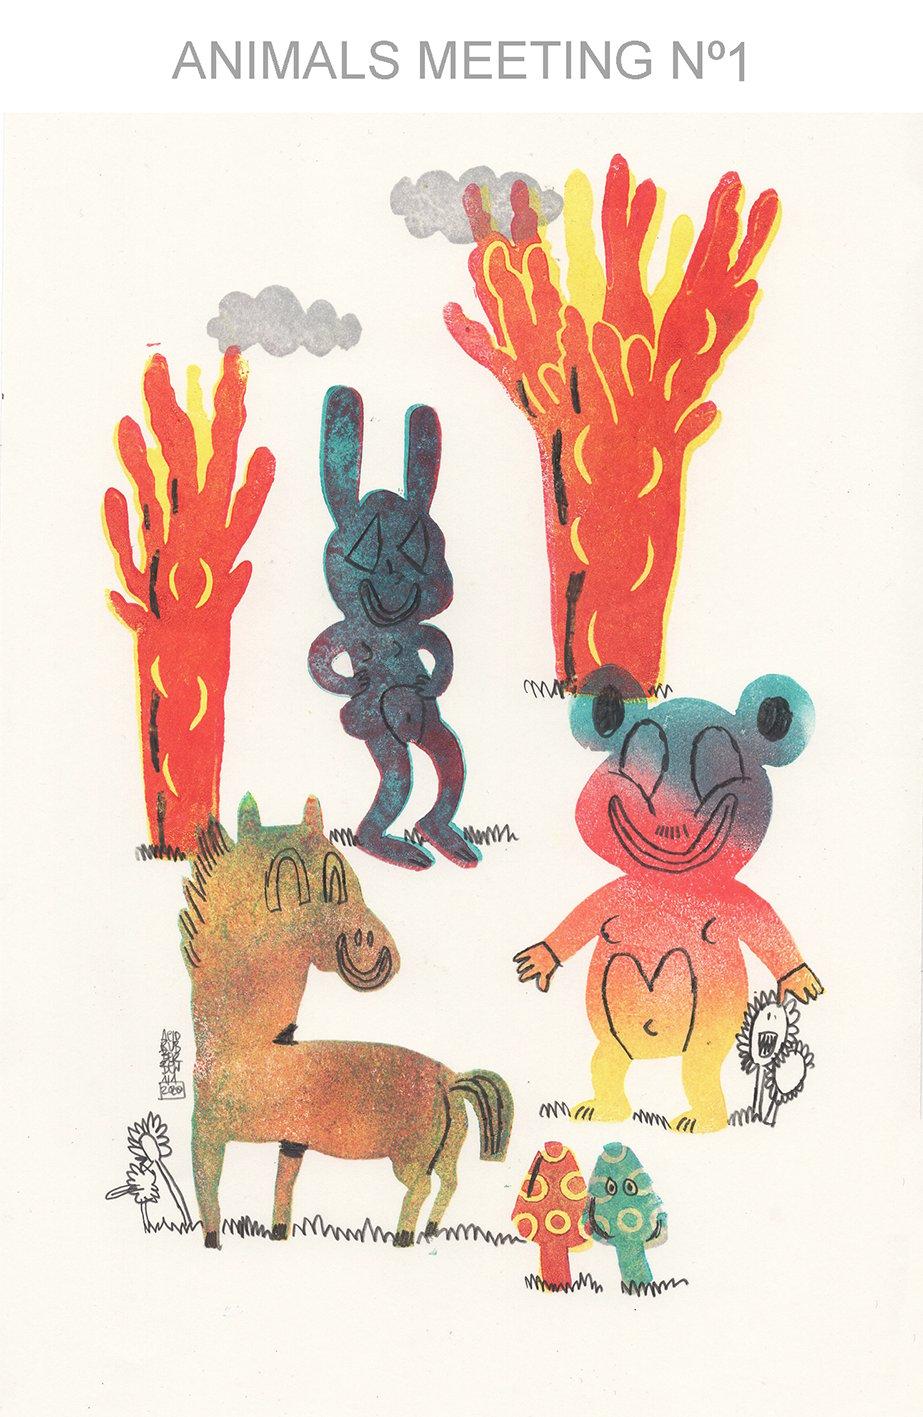 Image of ANIMALS MEETING